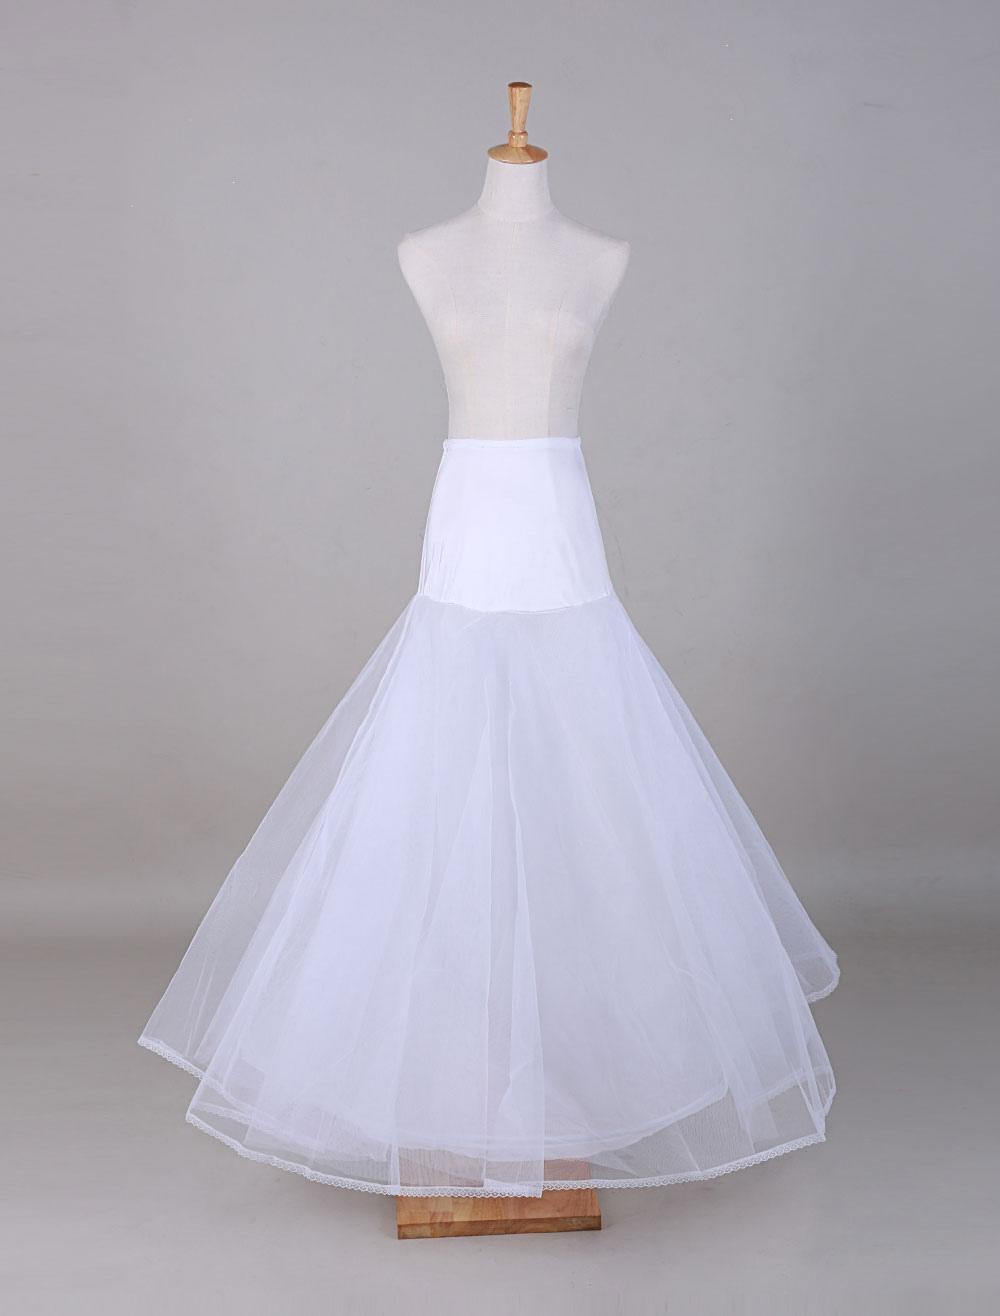 White Tulle A-Line Slip Wedding Petticoat